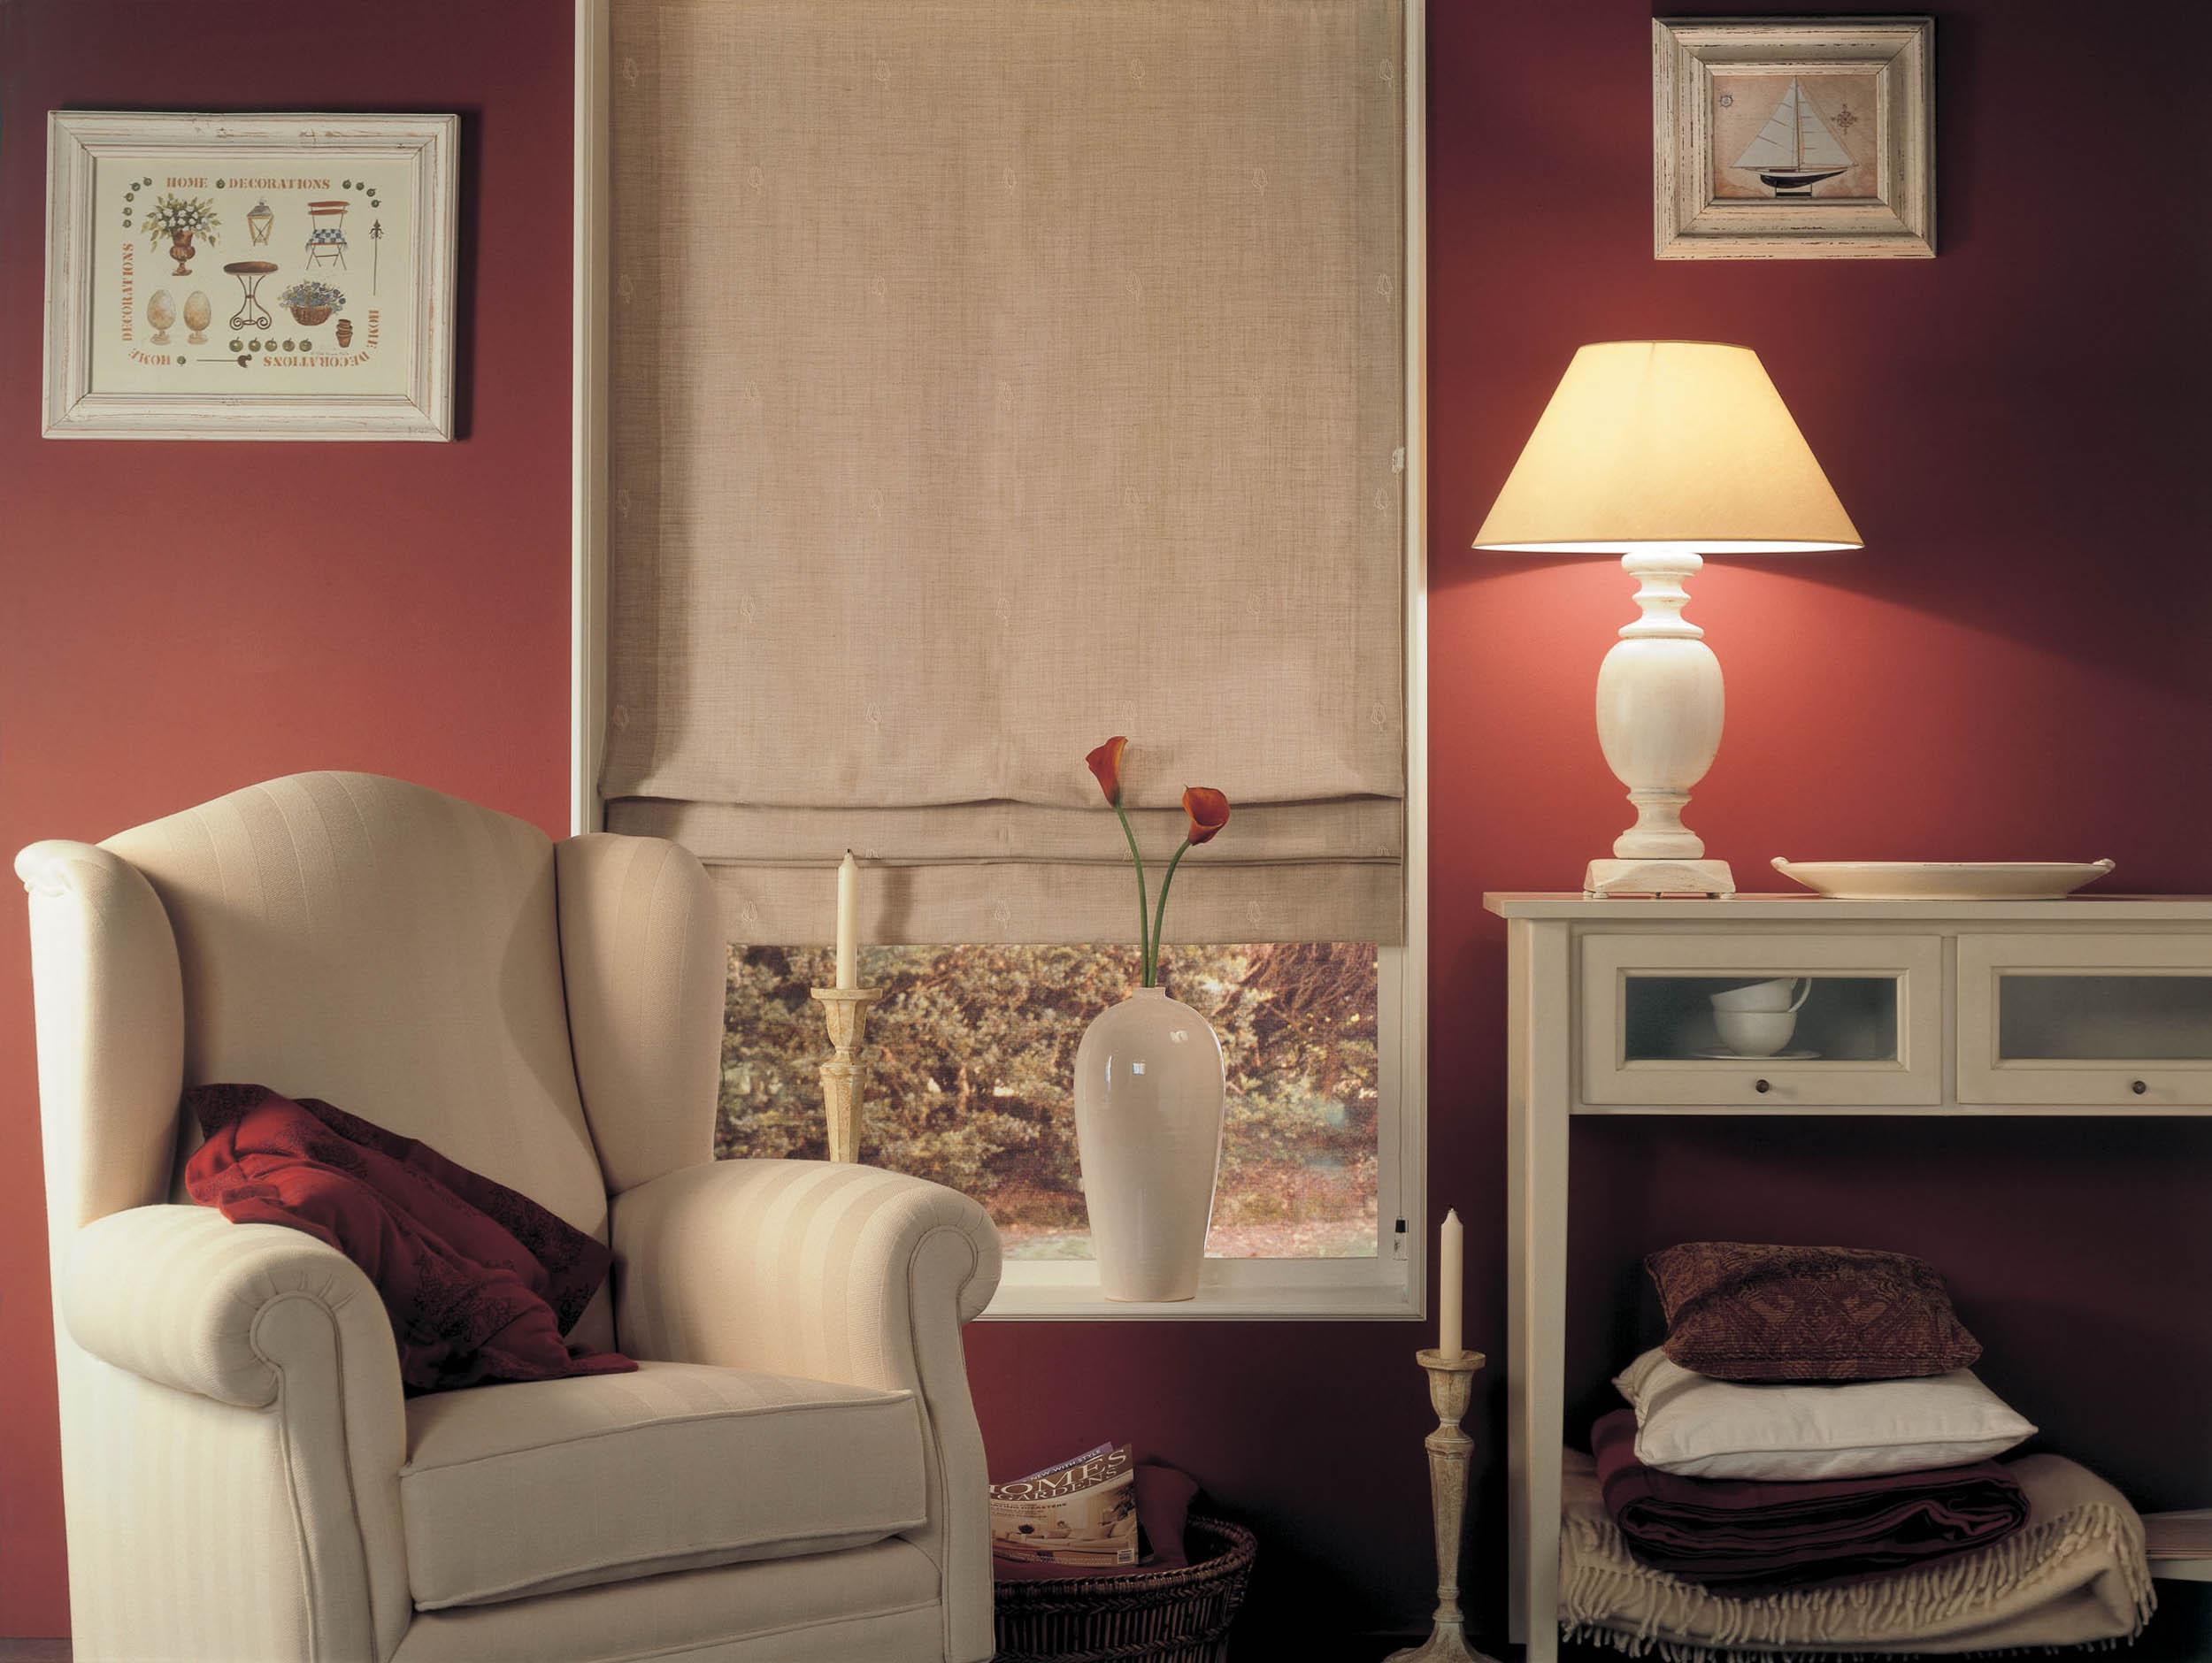 raffrollos in frankfurt oder leipzig gesucht abc jalousien. Black Bedroom Furniture Sets. Home Design Ideas